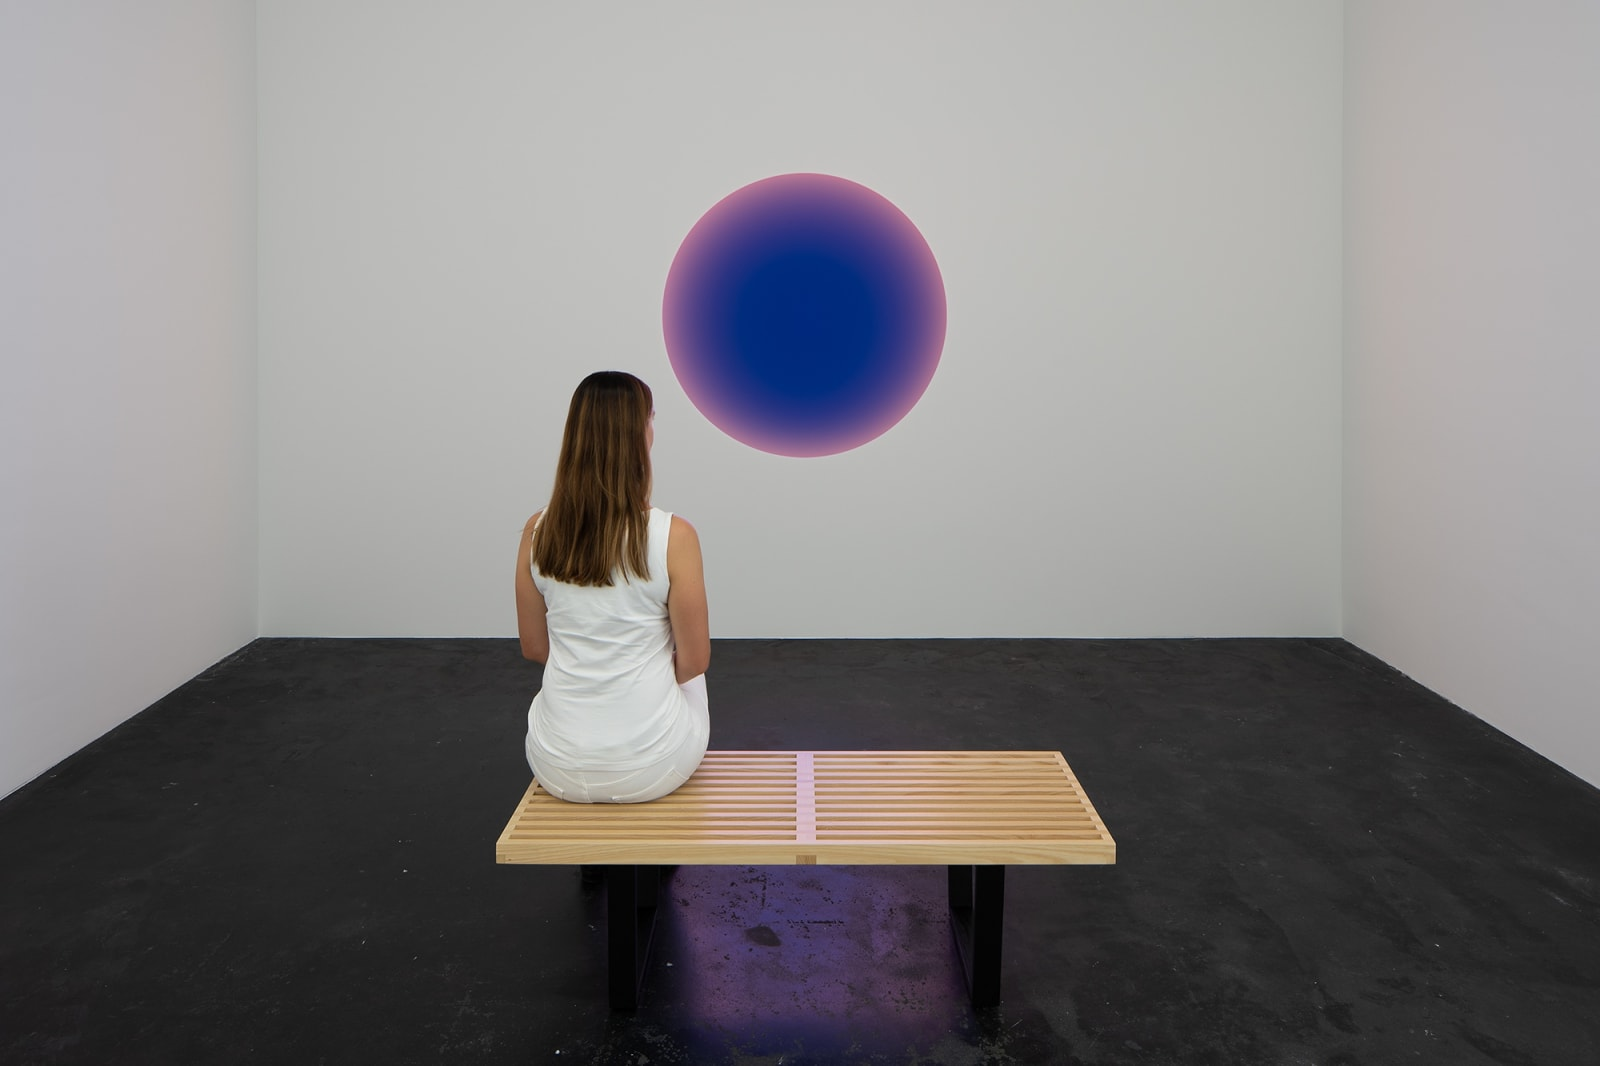 Courtesy of Häusler Contemporary | Photo: Florian Holzherr